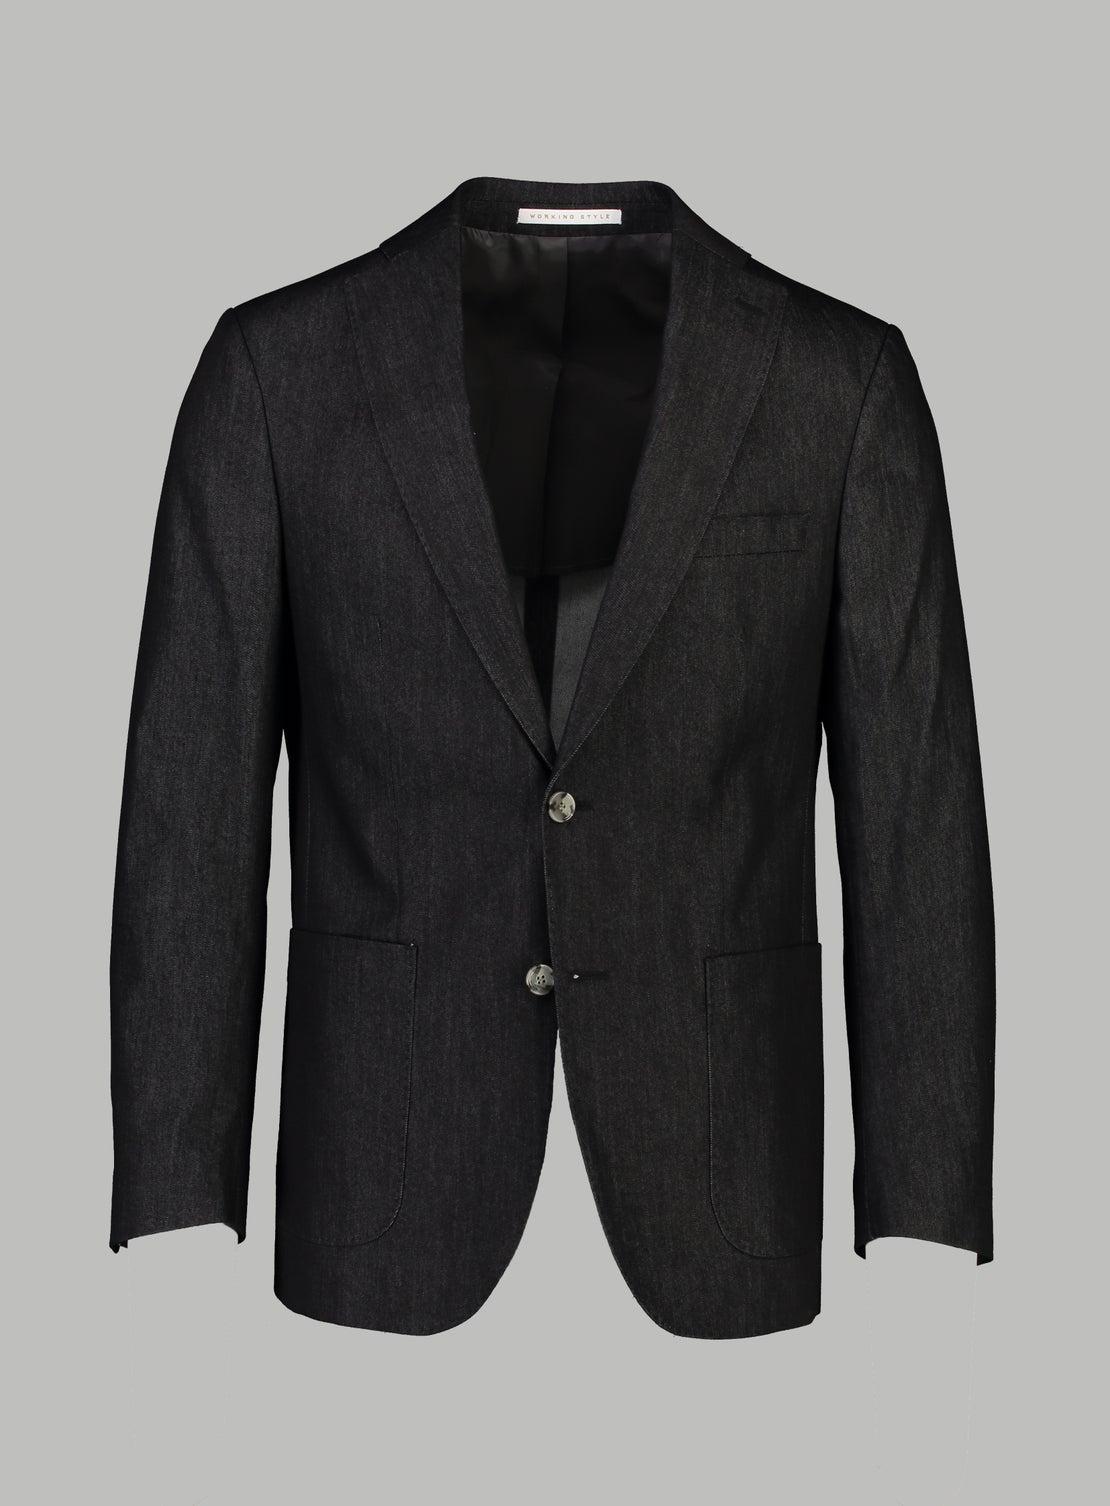 Black Twill Cotton Separates Jacket